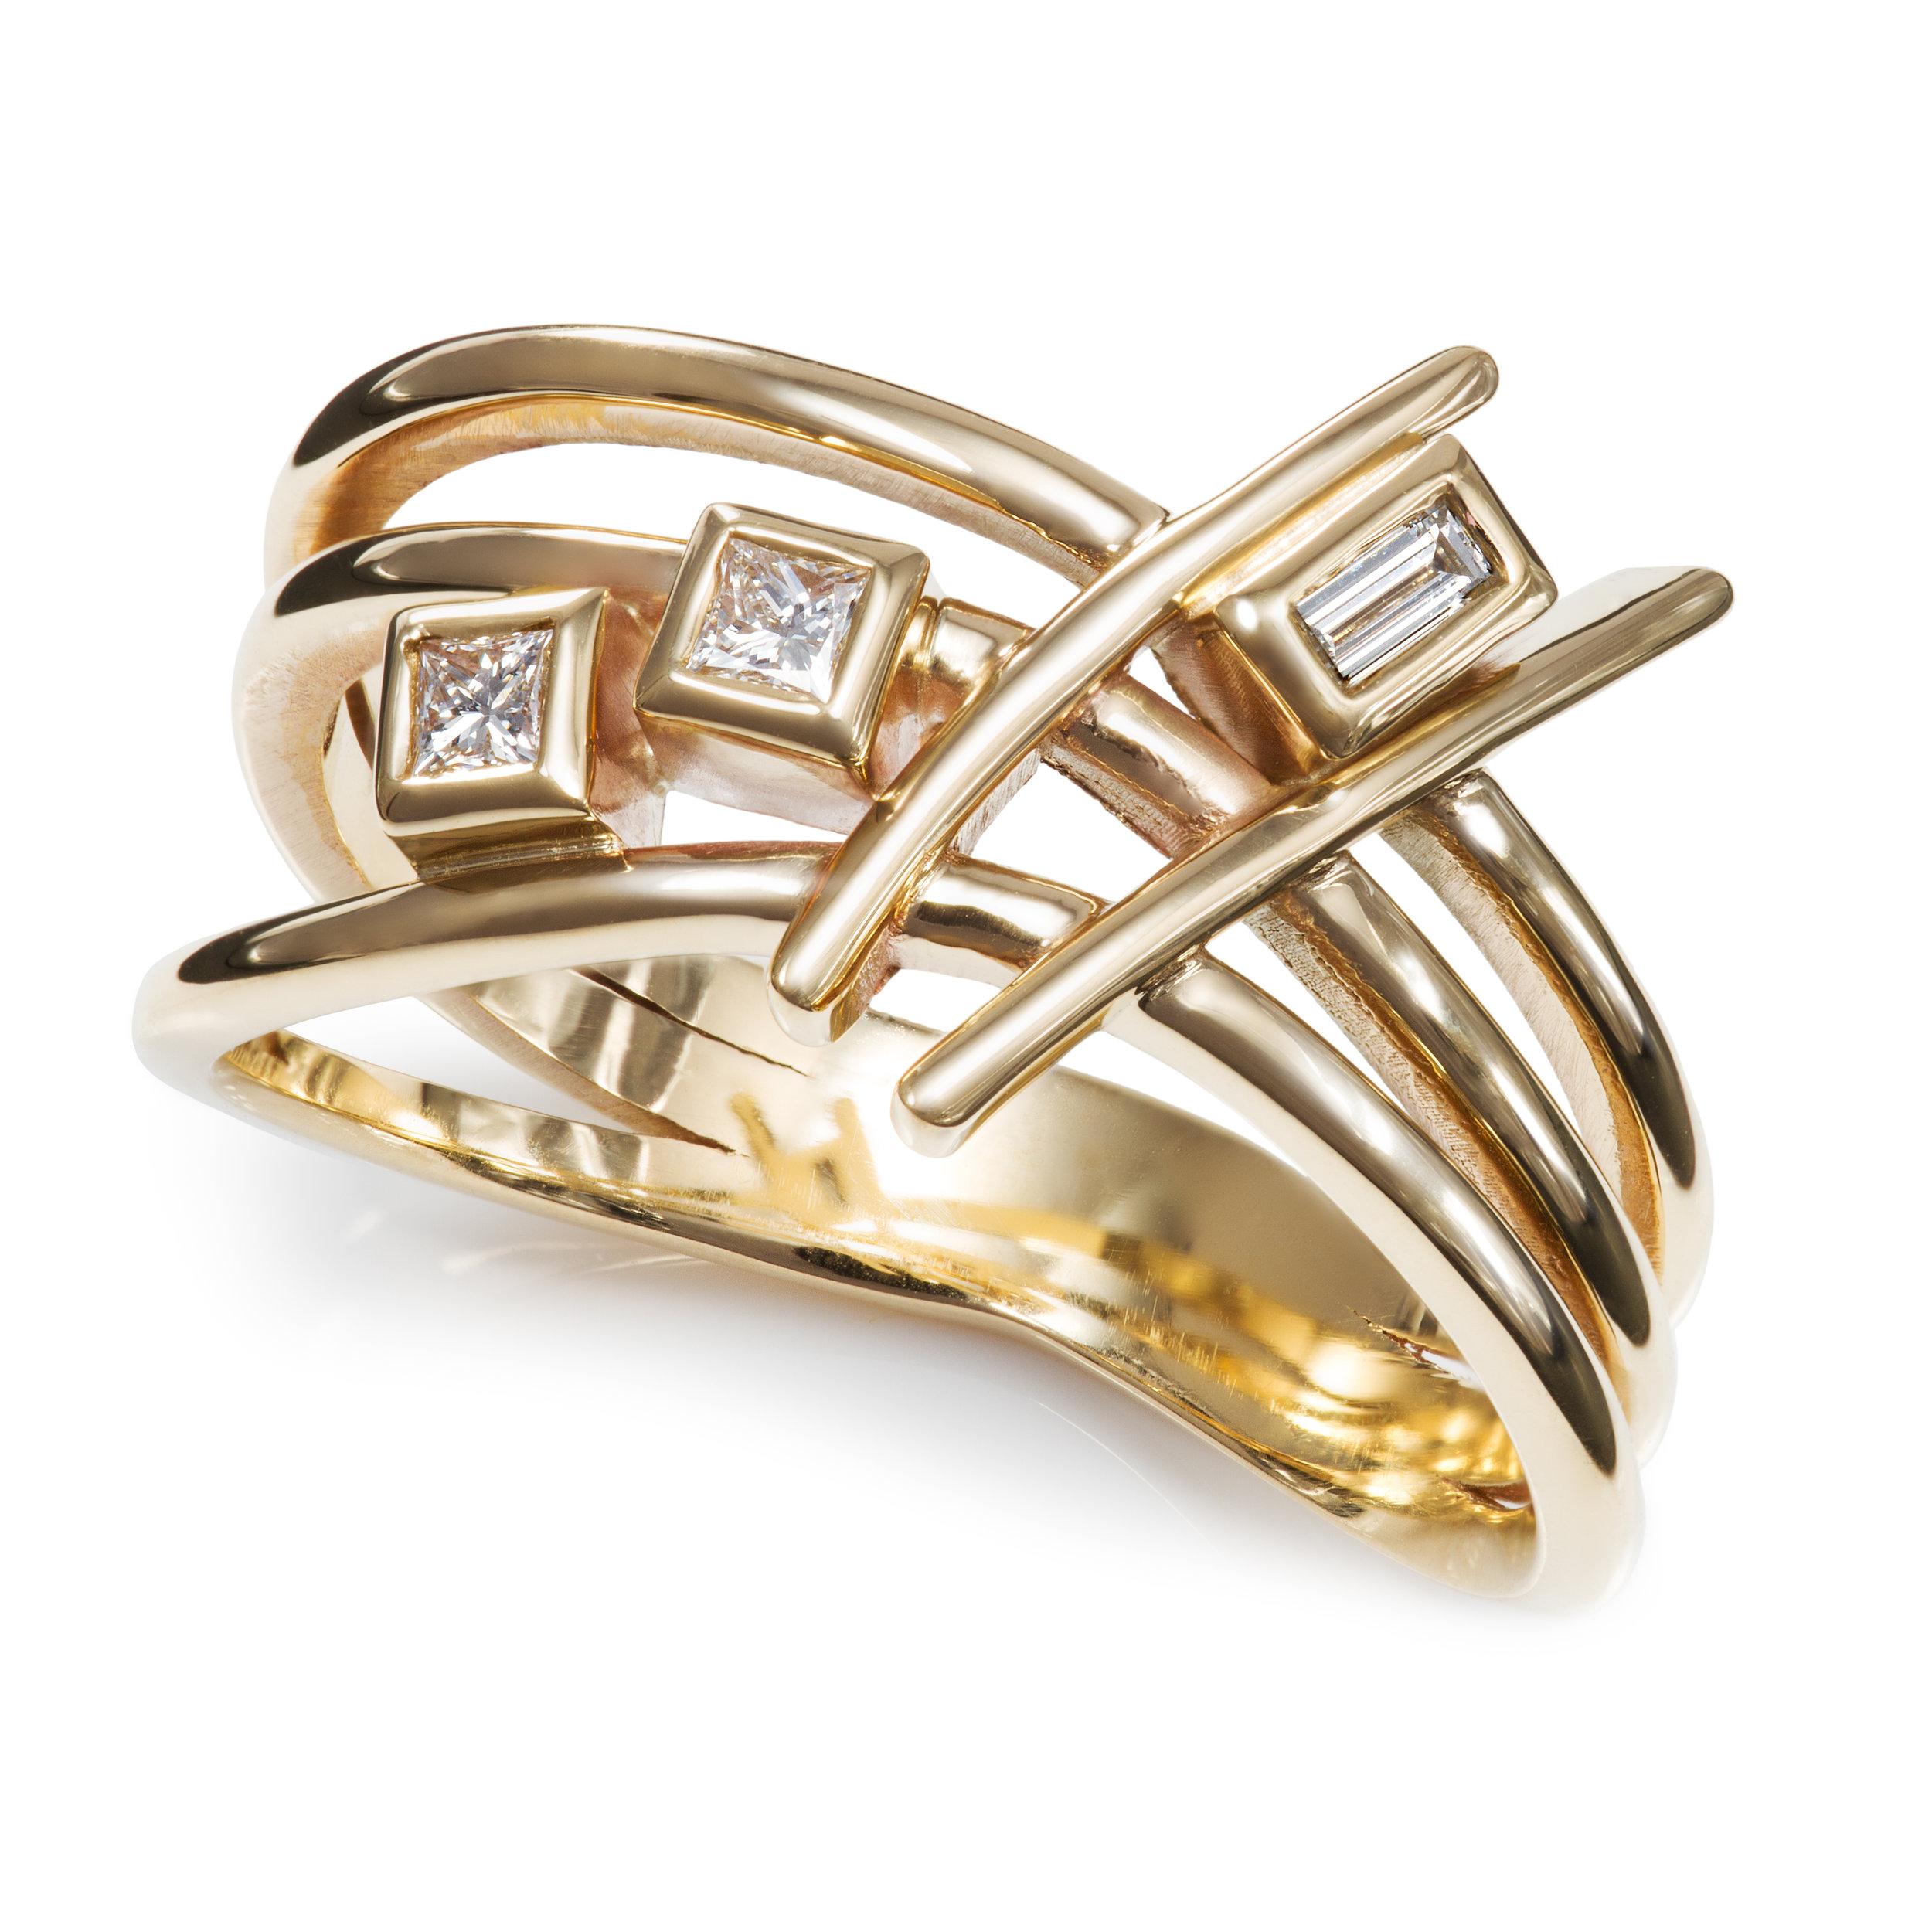 Bespoke 9ct yellow gold and diamond dress ring commission